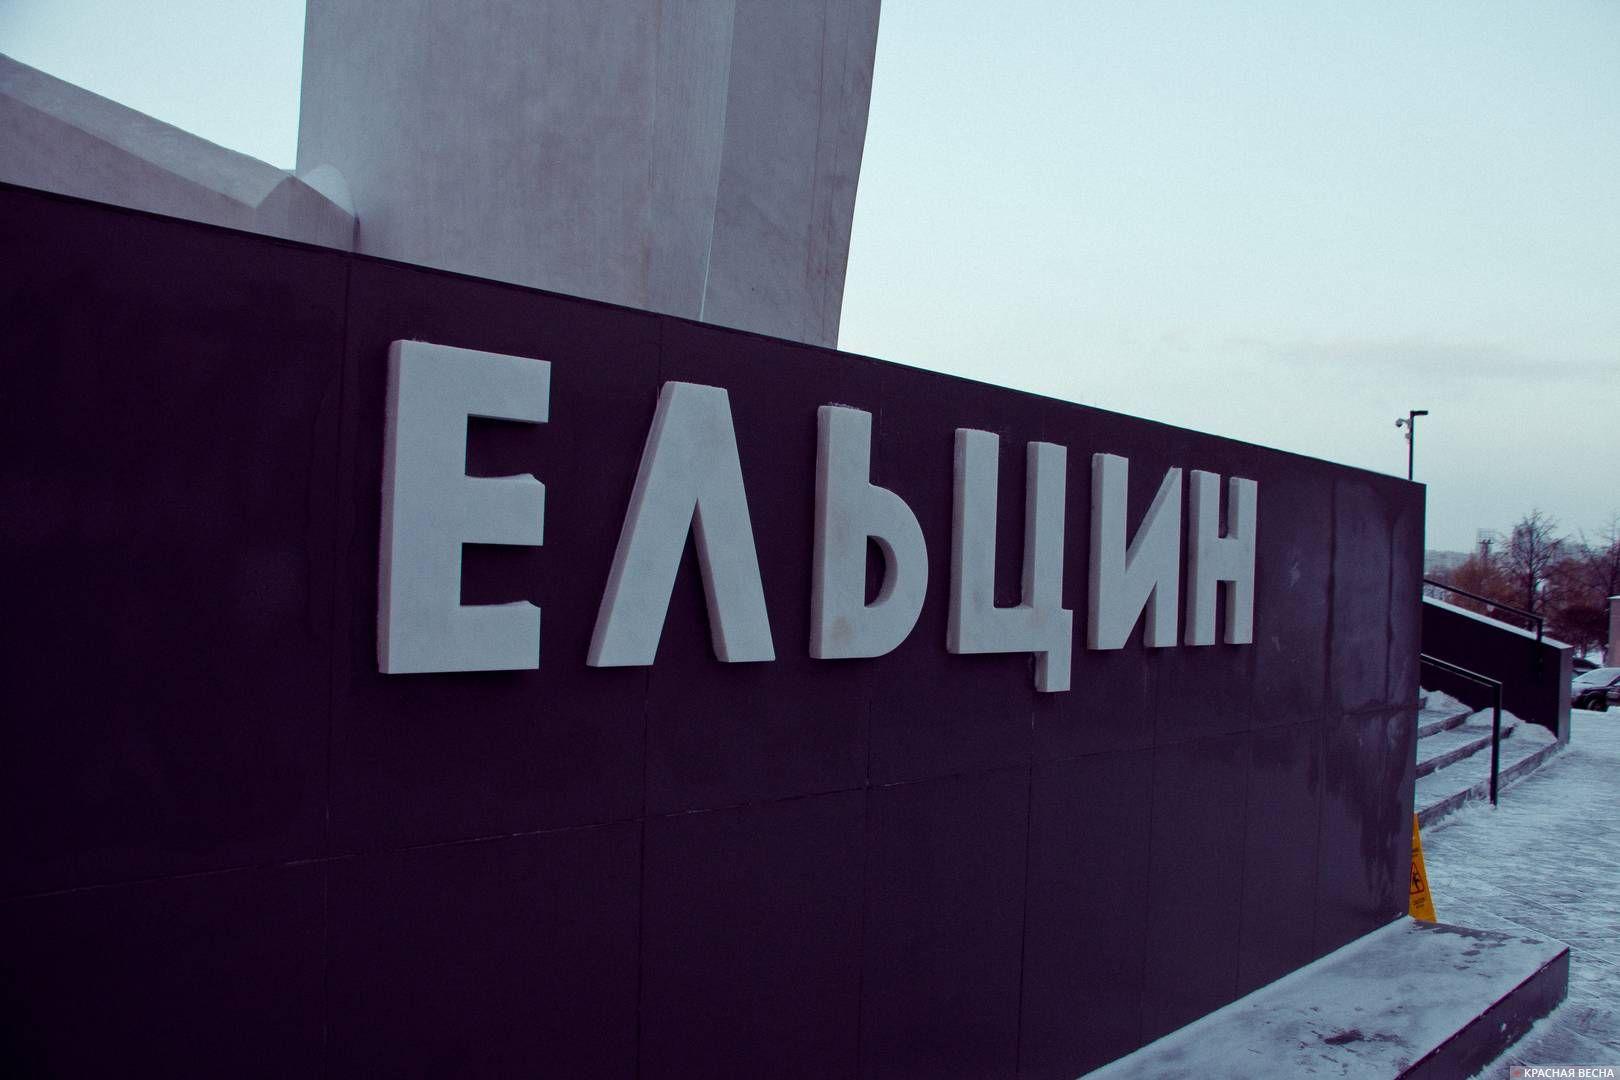 Ельцин. Екатеринбург